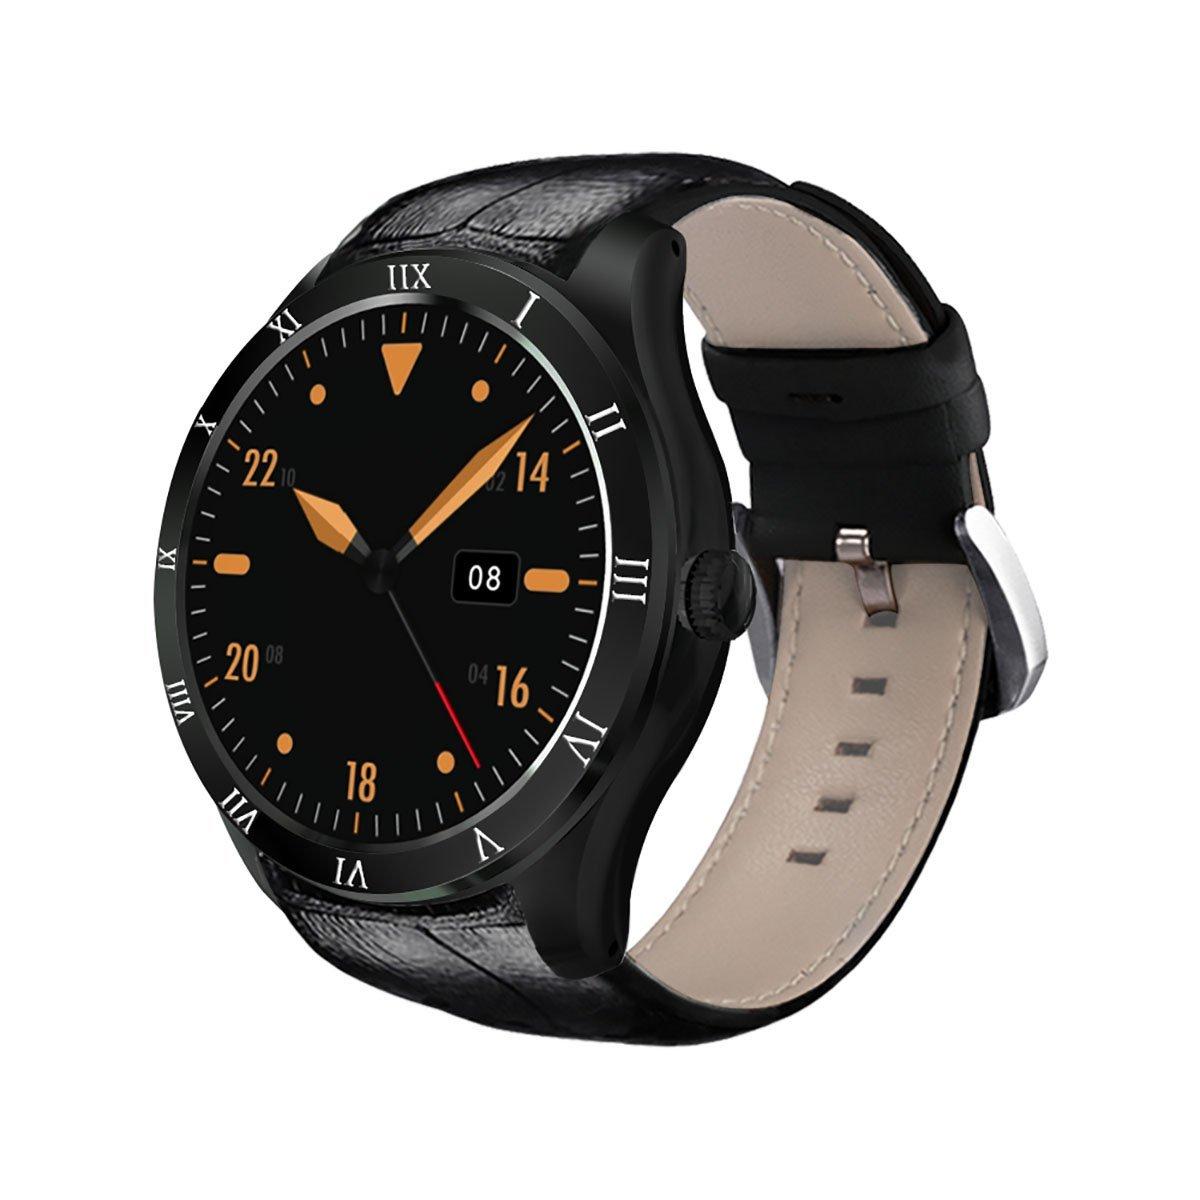 60%OFF urlhasbeenblocked DI05 Smart Watch Bluetooth MTK6580 Support WIFI GPS Microphone Speaker 3G Nano SIM $35.99